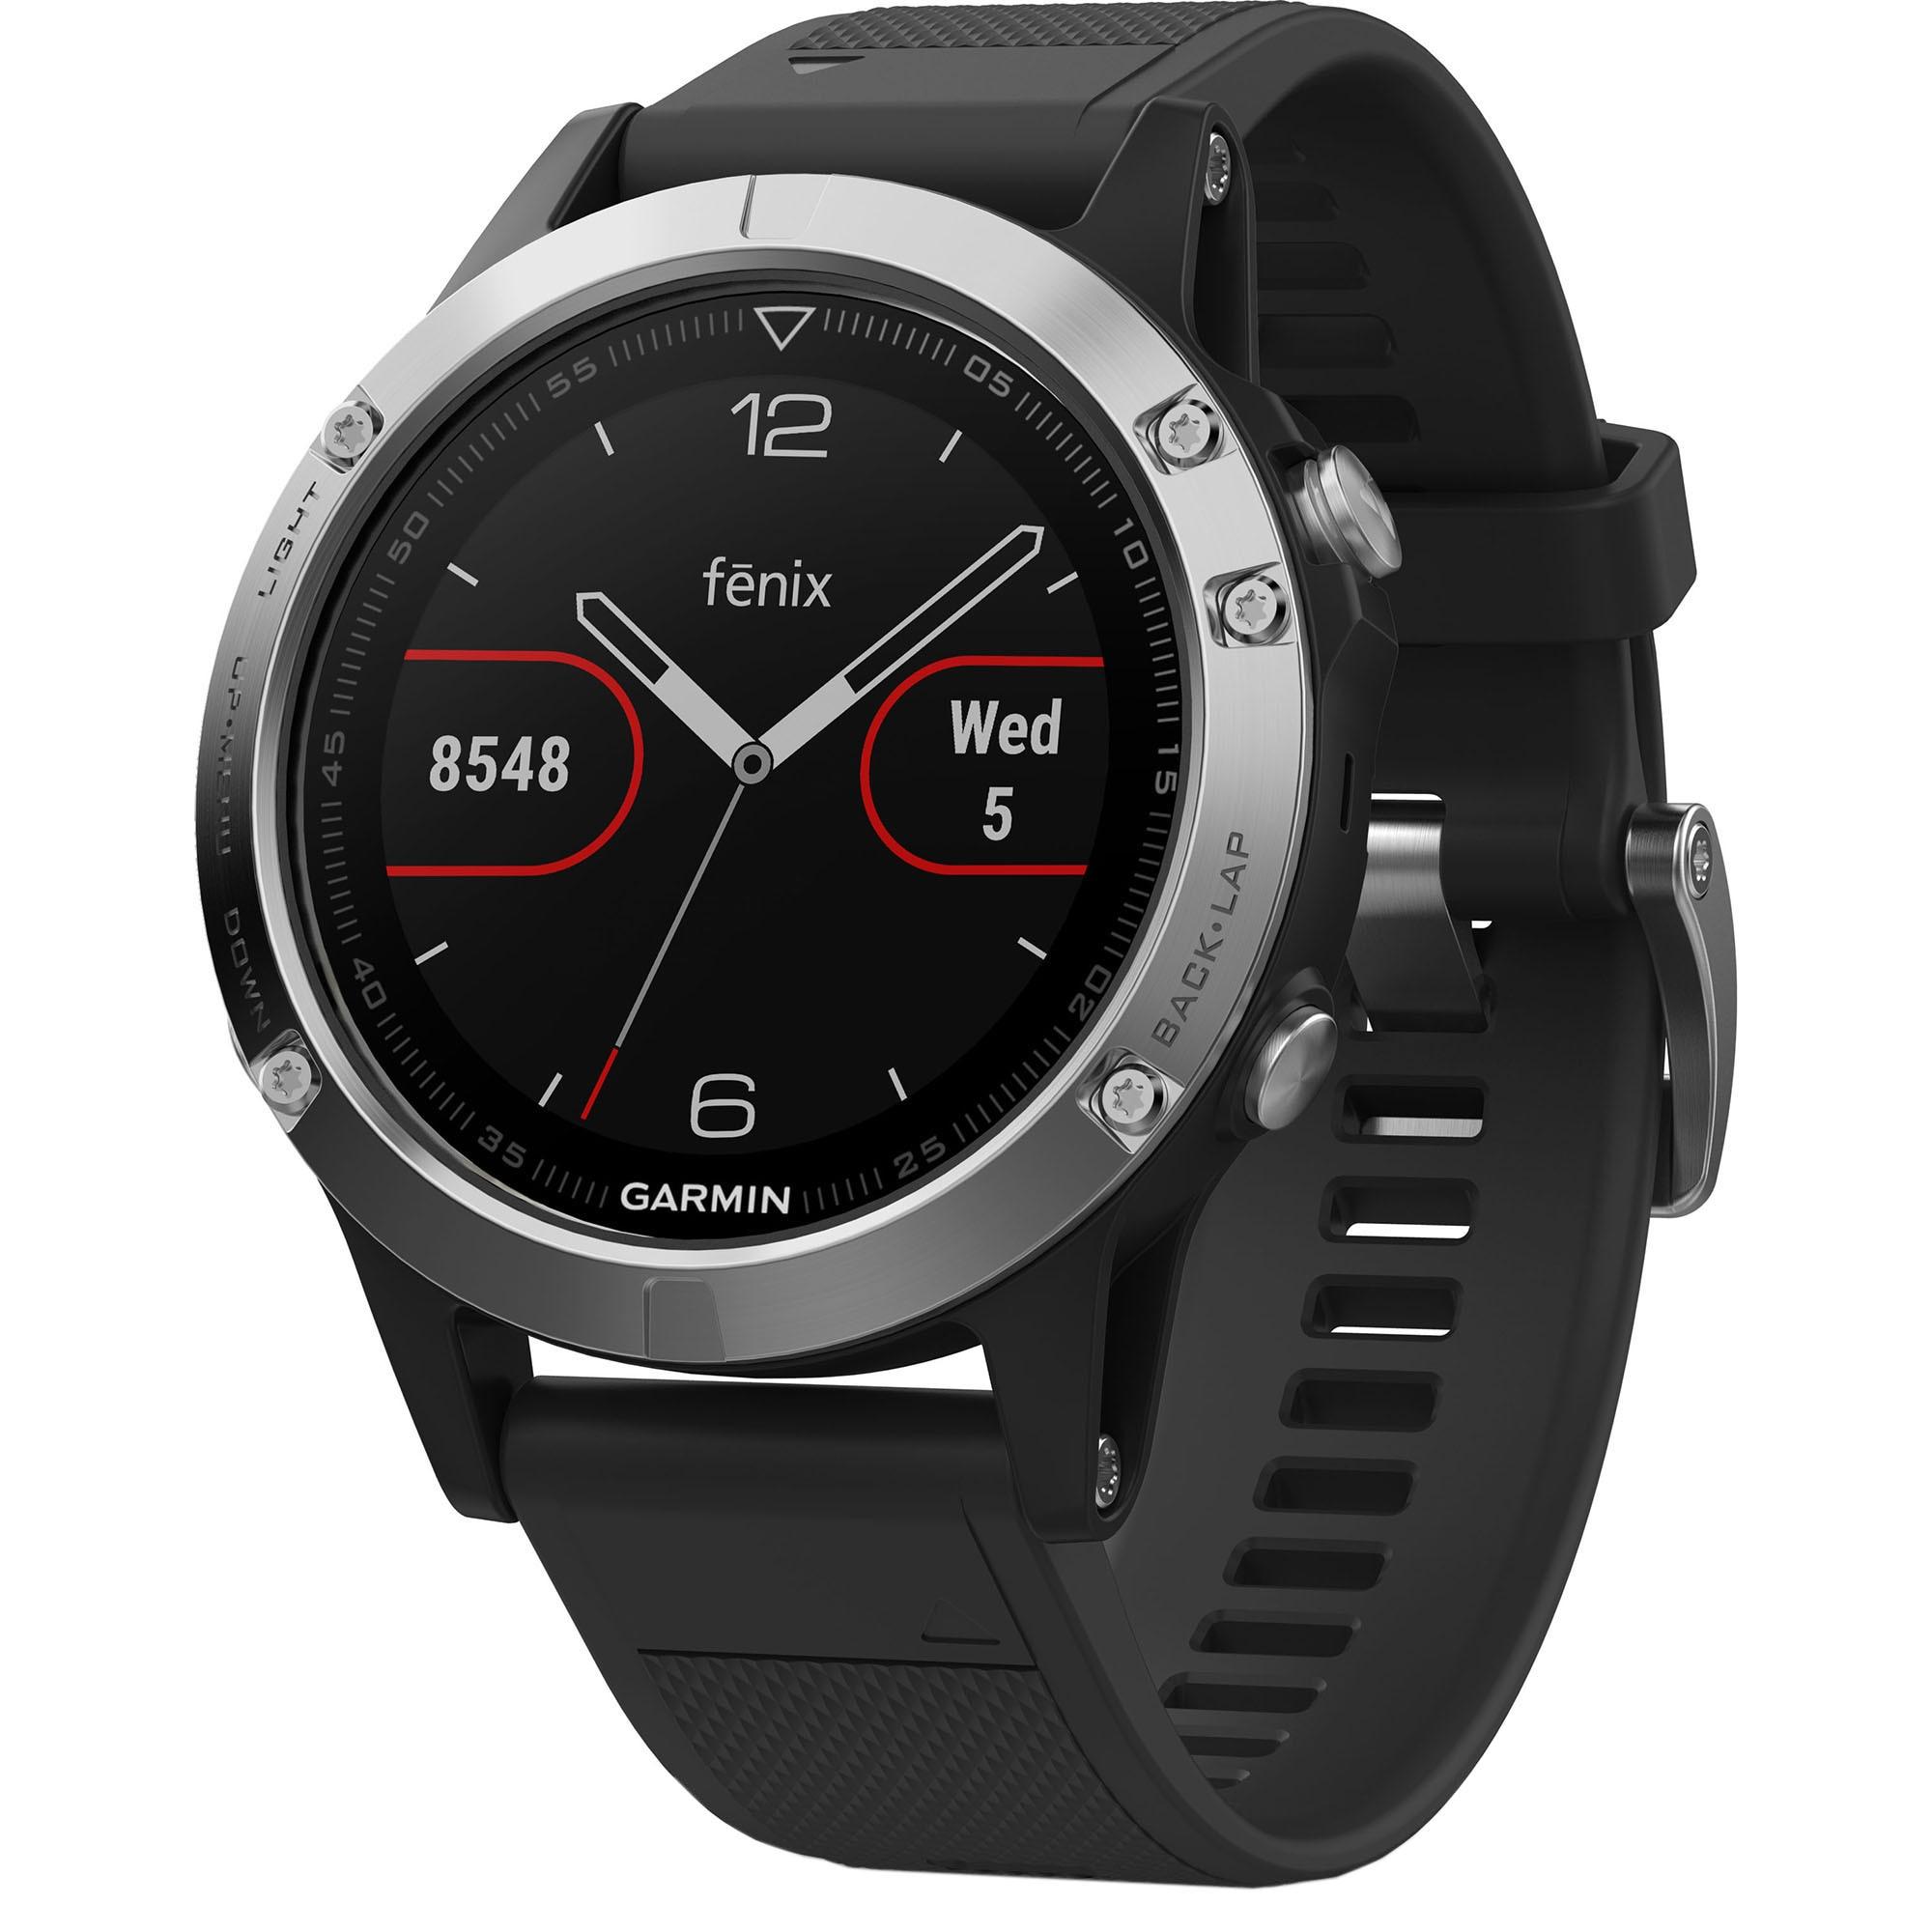 Fotografie Ceas smartwatch Garmin Fenix 5, HR, GPS, Silver, Silicone Black